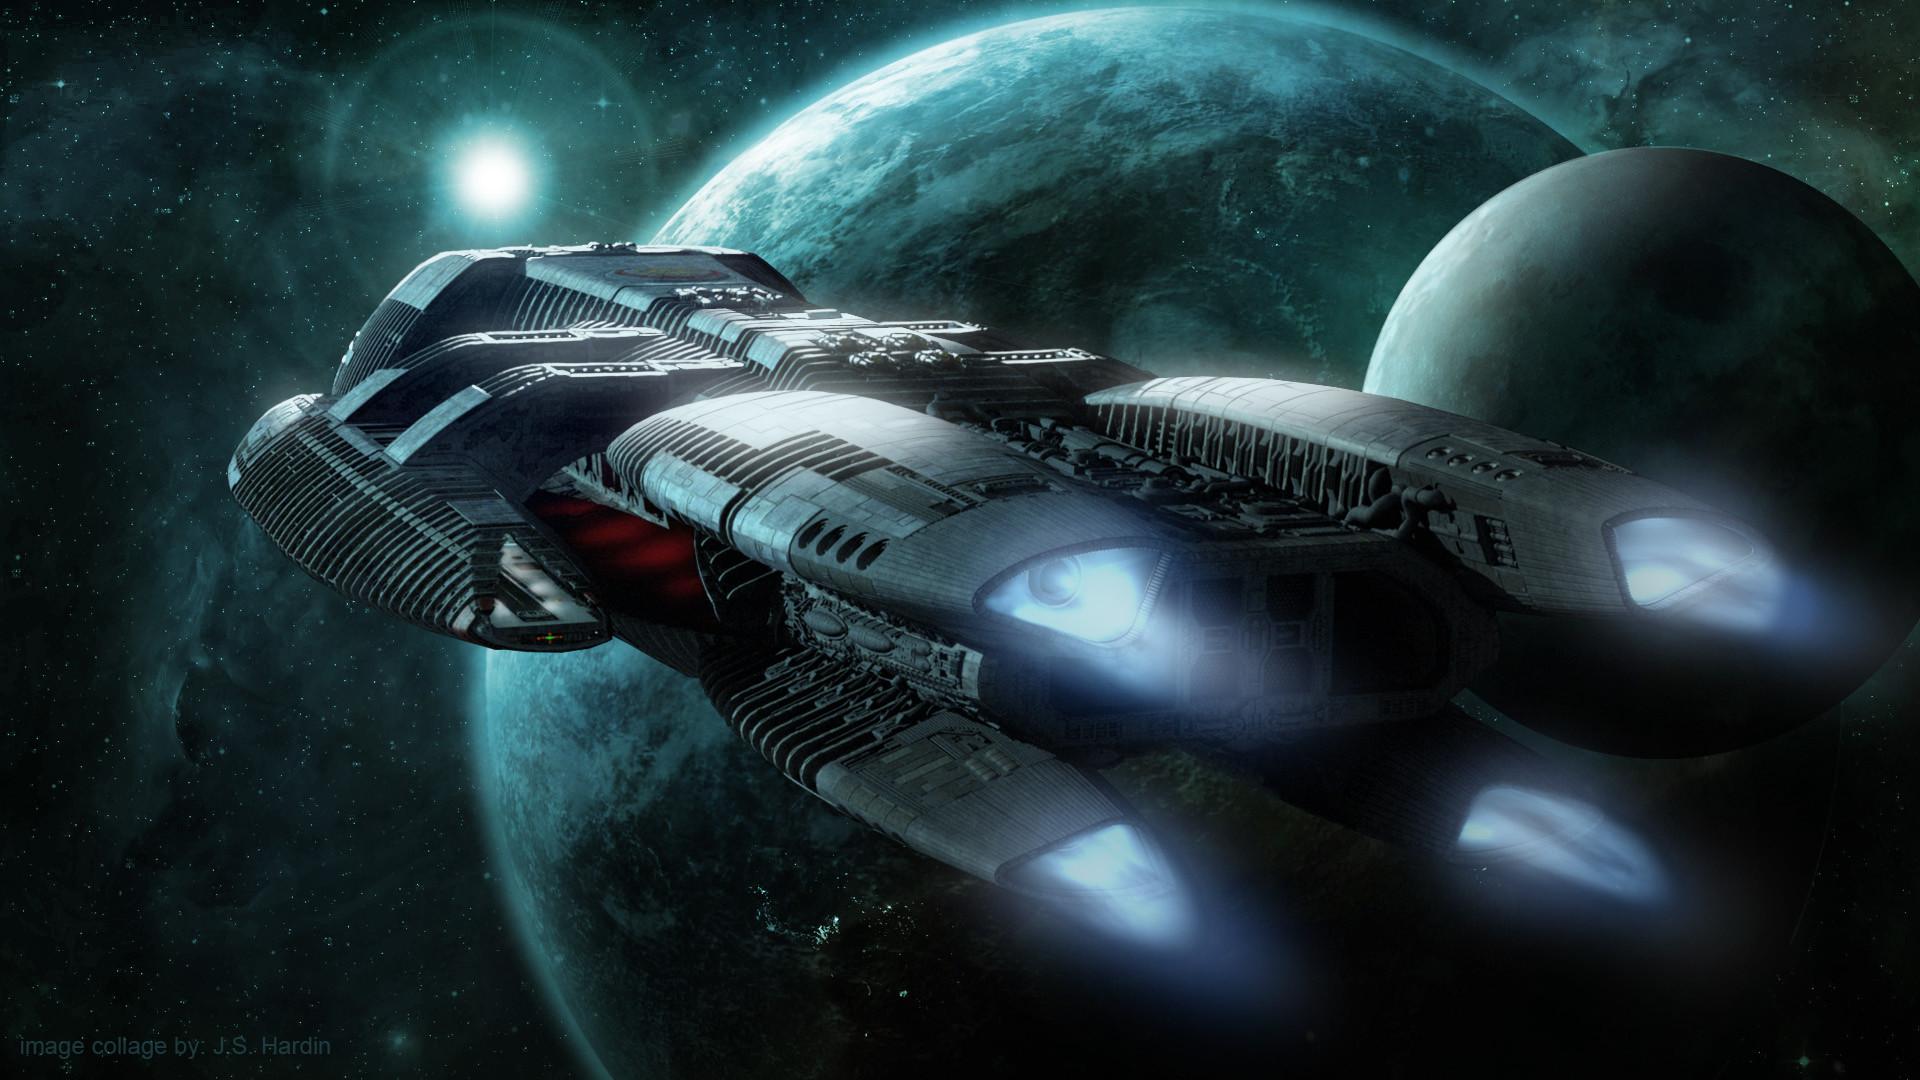 Battlestar Galactica Wallpaper Battlestar, Galactica